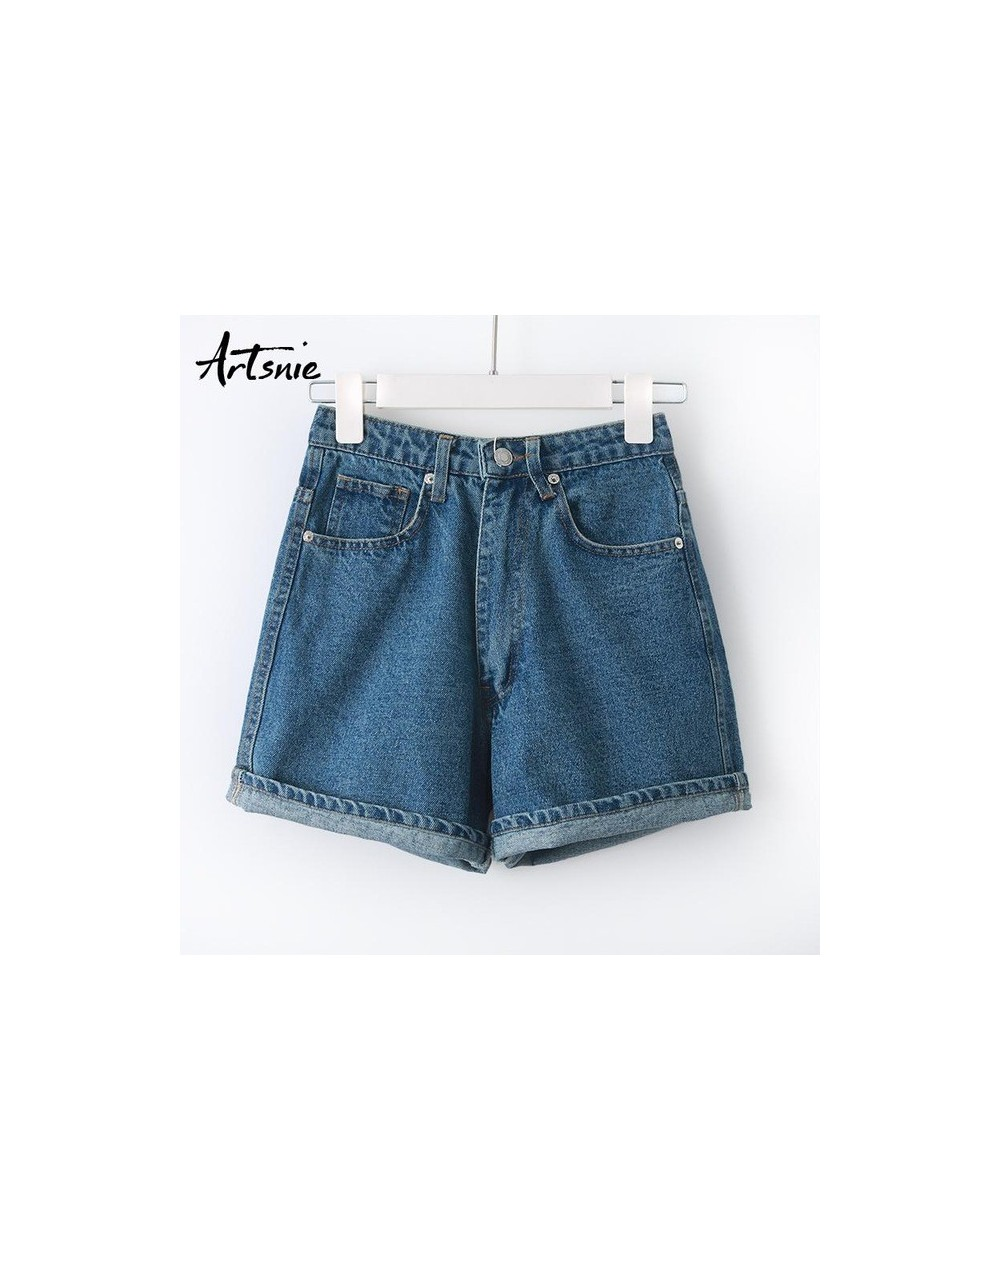 streetwear casual blue denim women shorts summer 2019 high waist zipper boyfriend jeans girls shorts mujer feminino - Blue -...